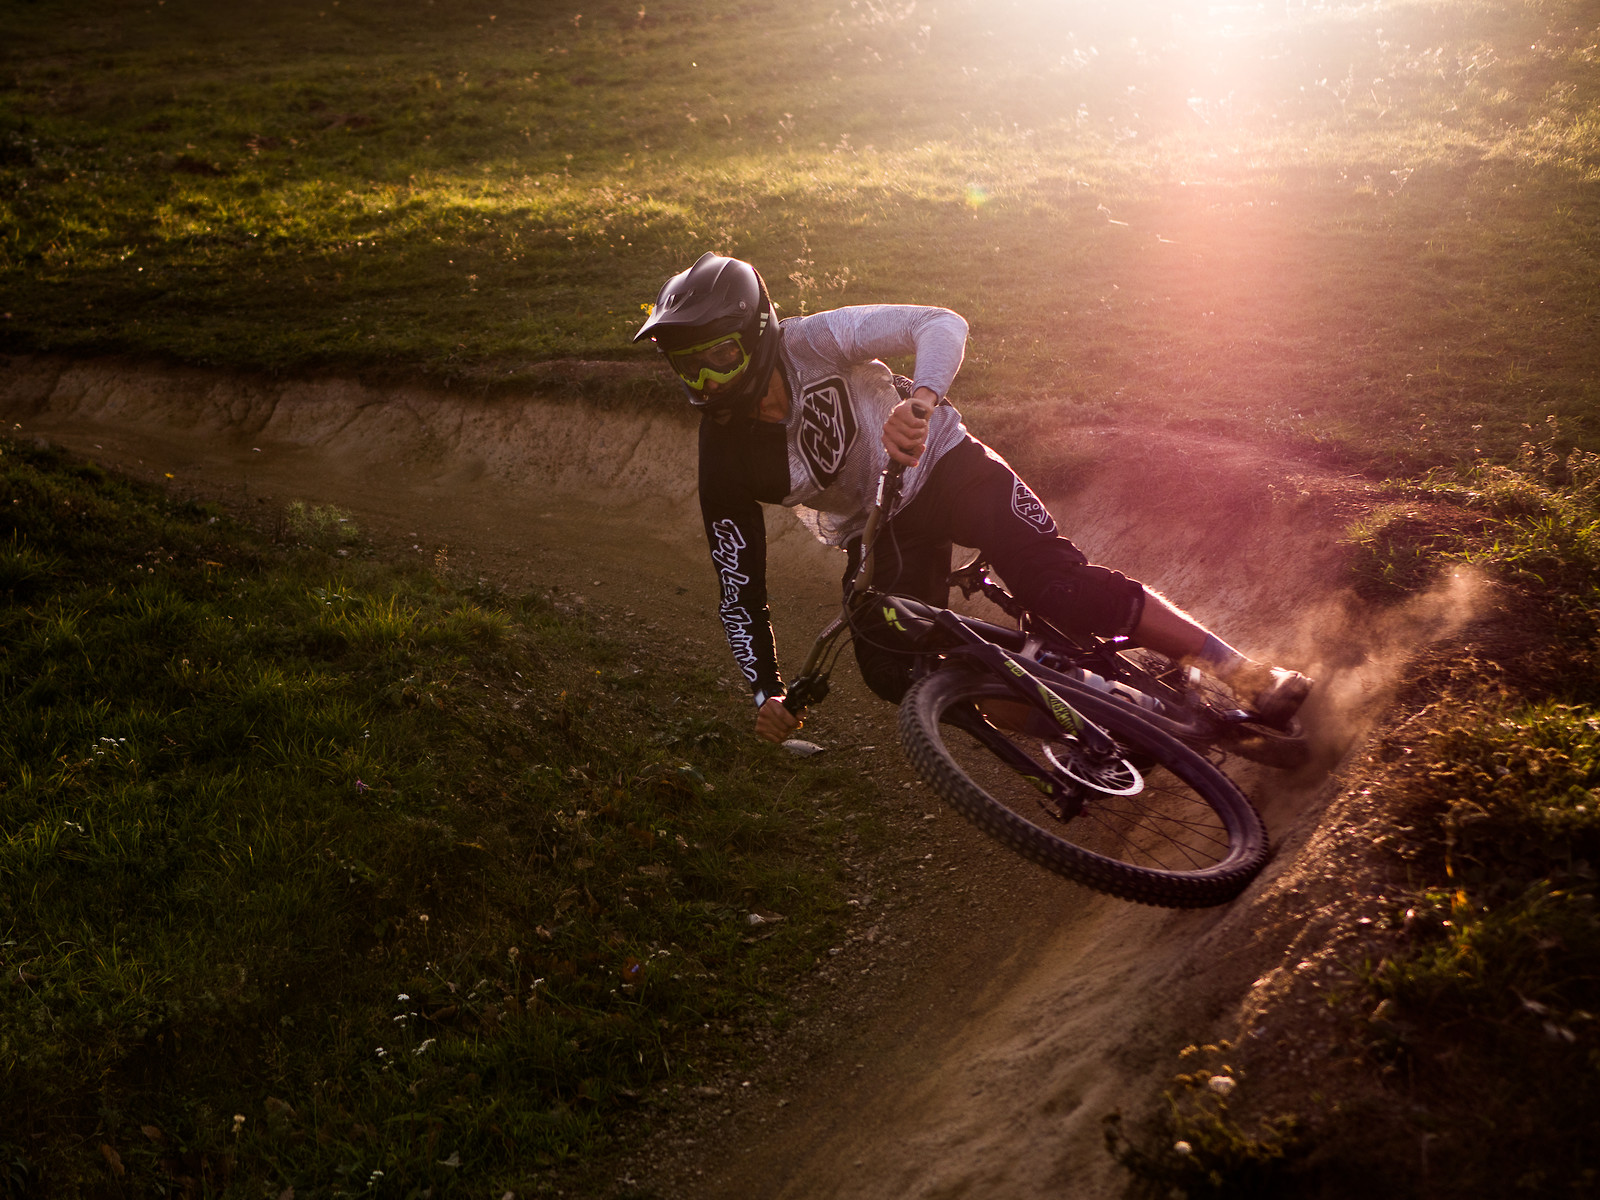 Autumn shred - EWIA - Mountain Biking Pictures - Vital MTB